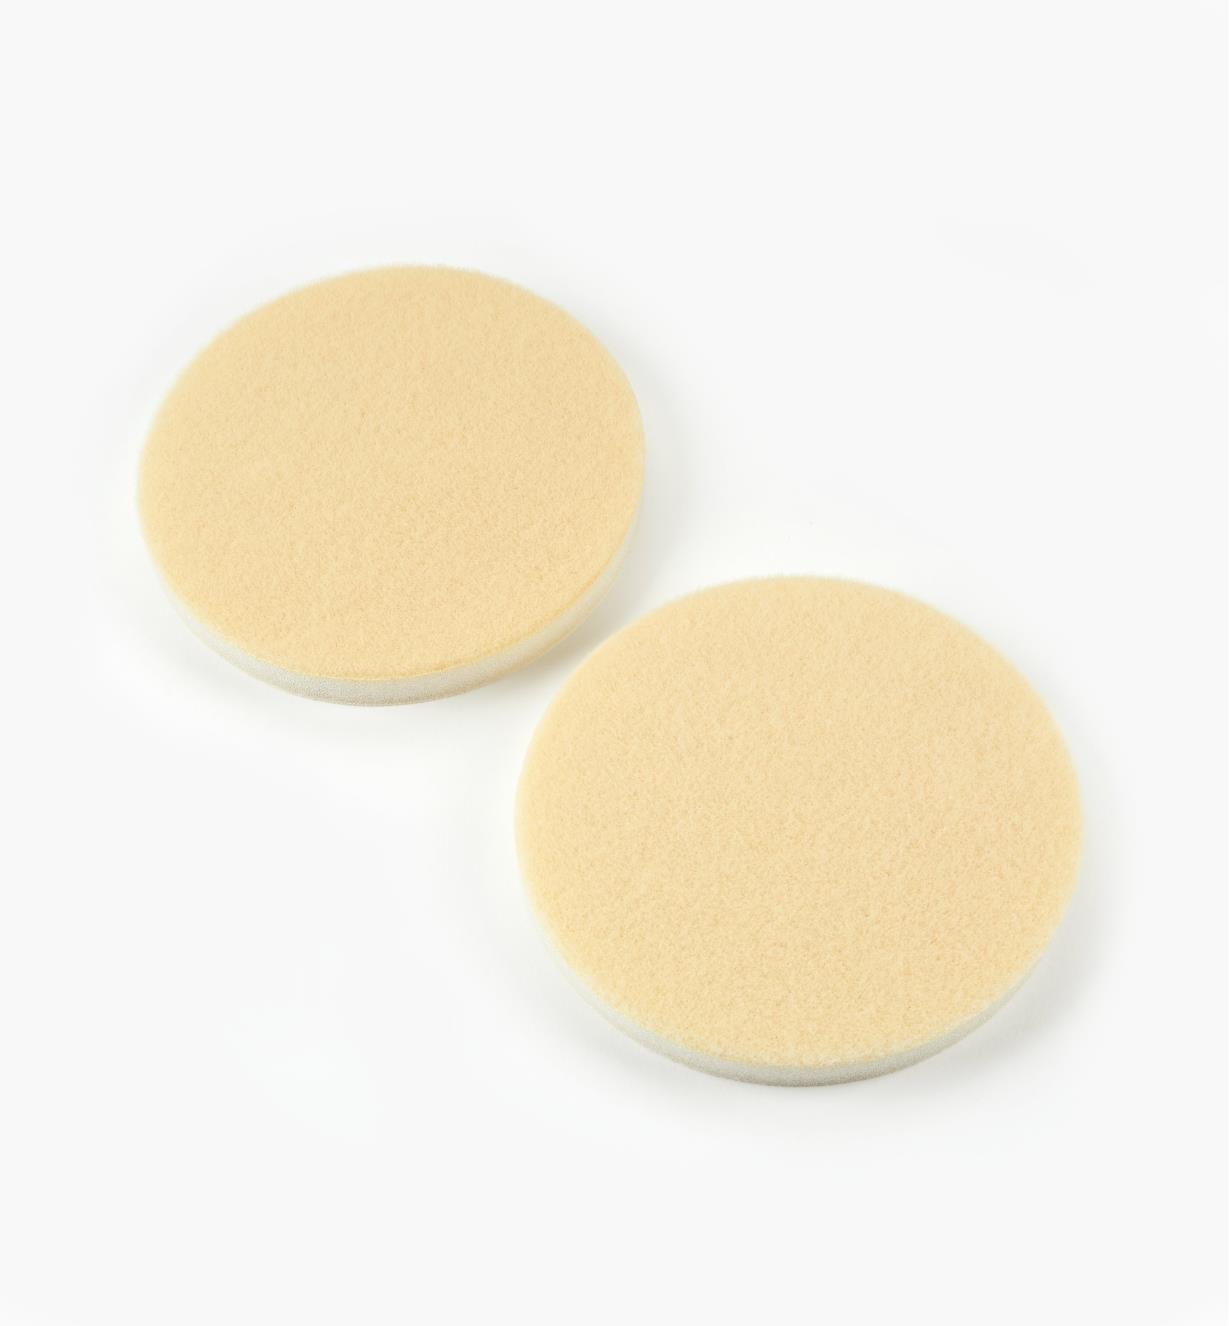 80K6322 - Tampon de polissage Surbuf de 61/2po, lapaire